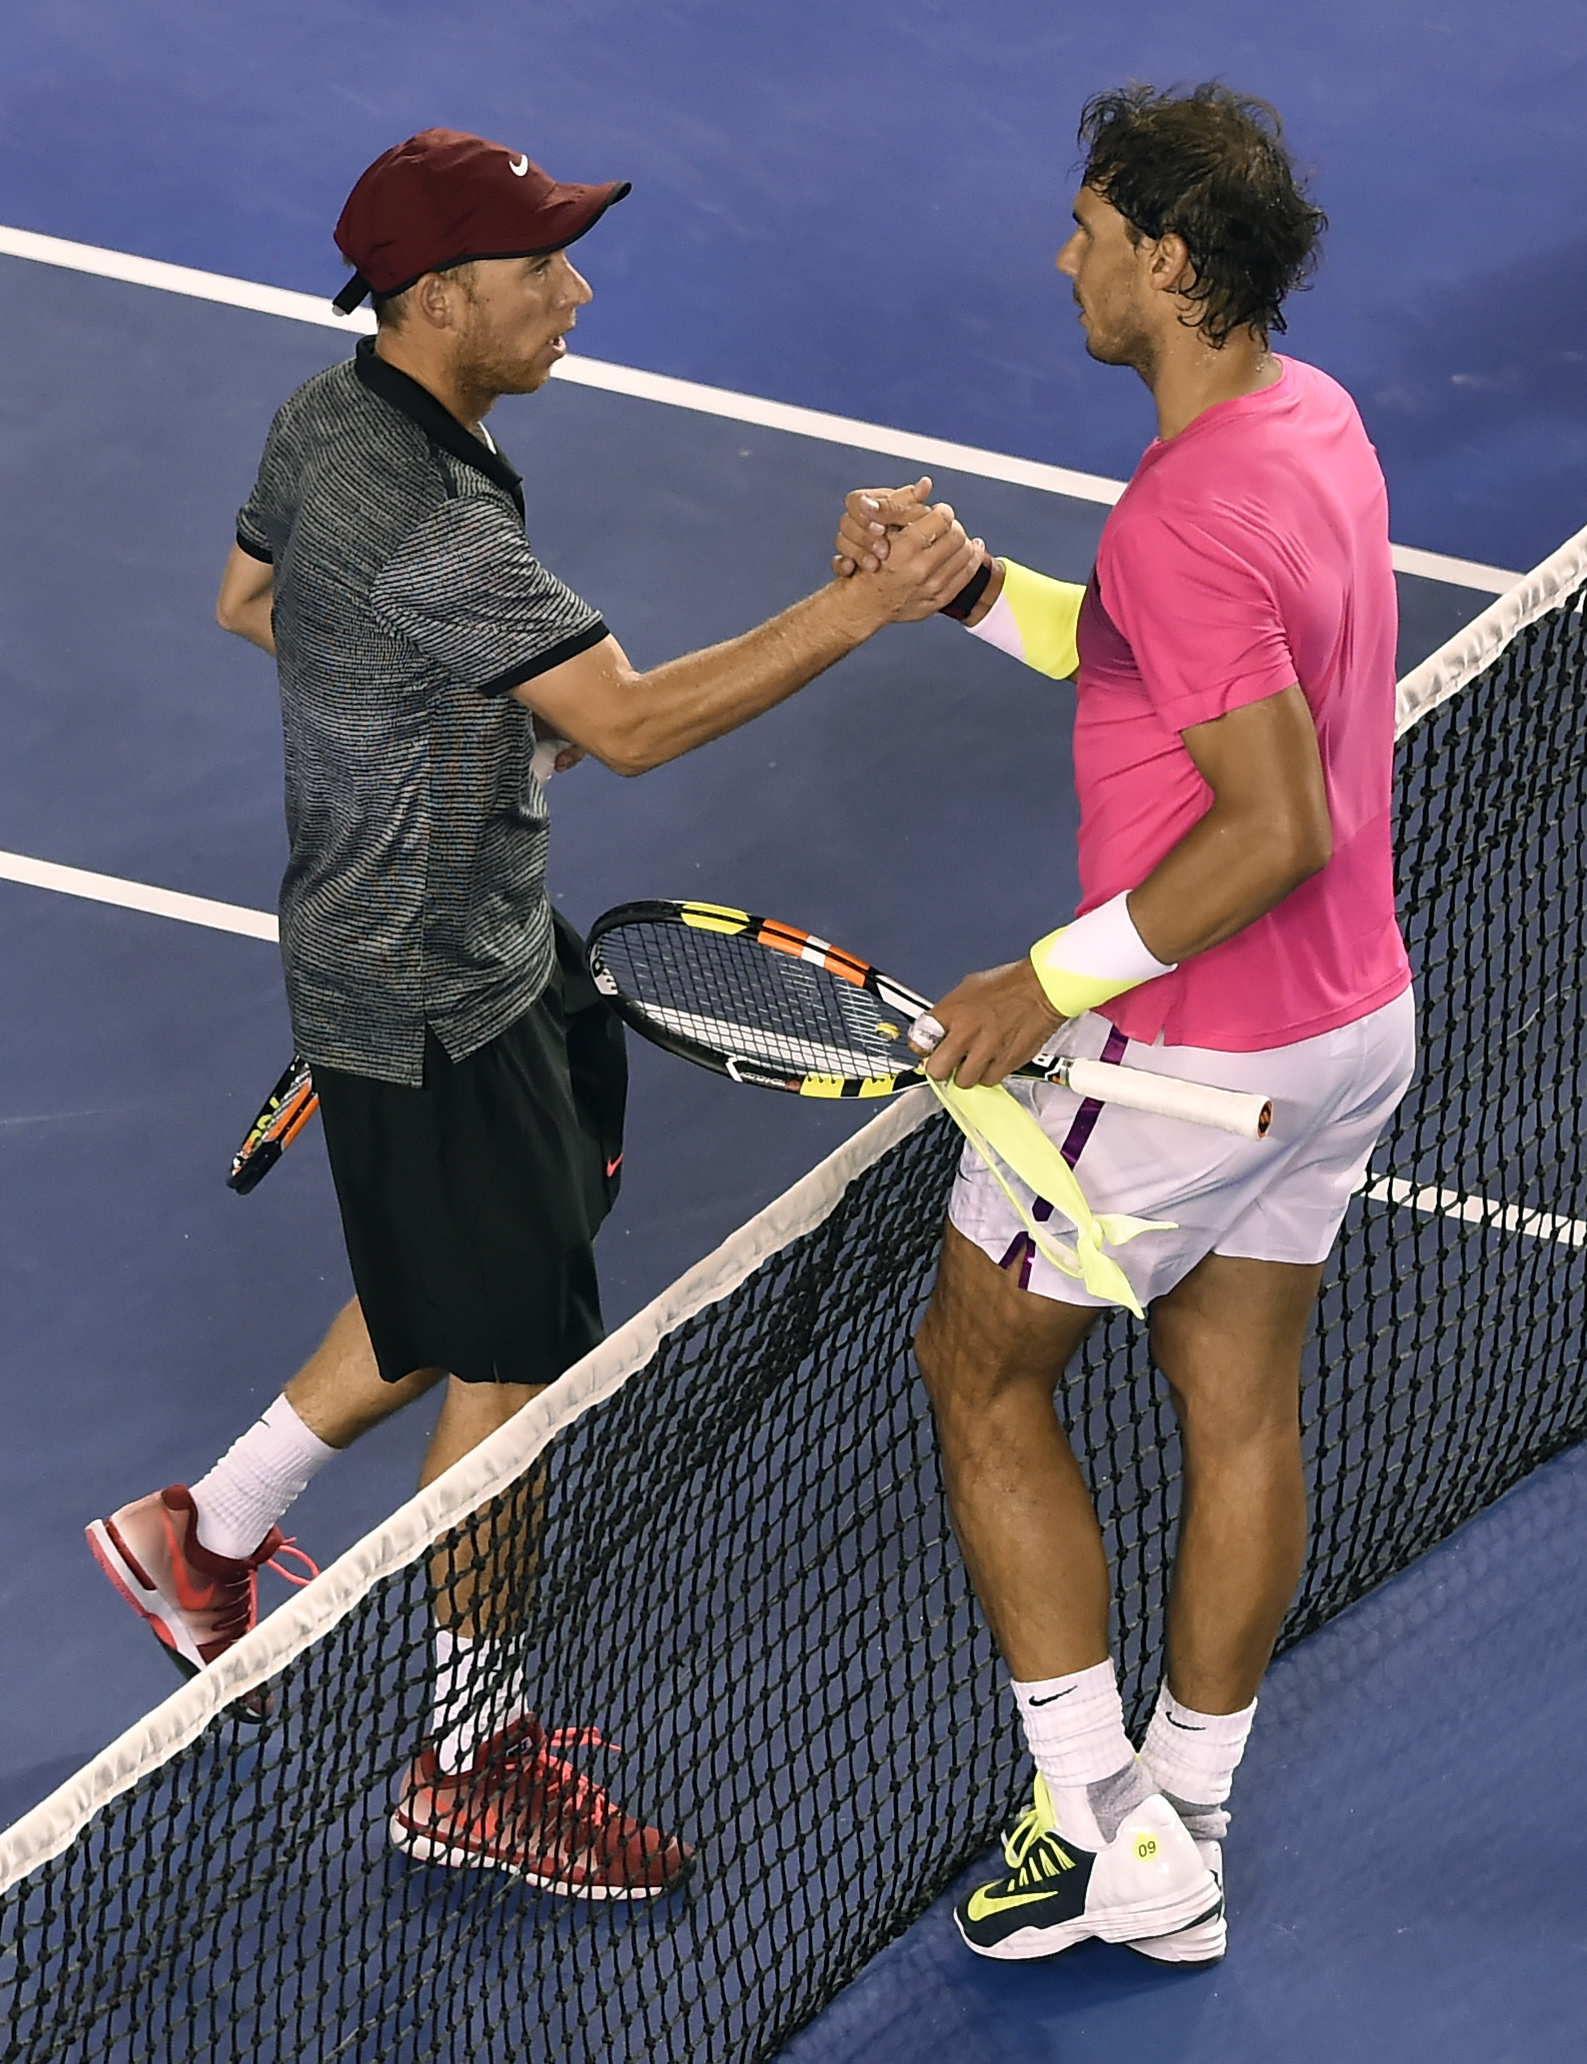 australian_open_tennis-9ea21facafb24365b_r3558.jpeg